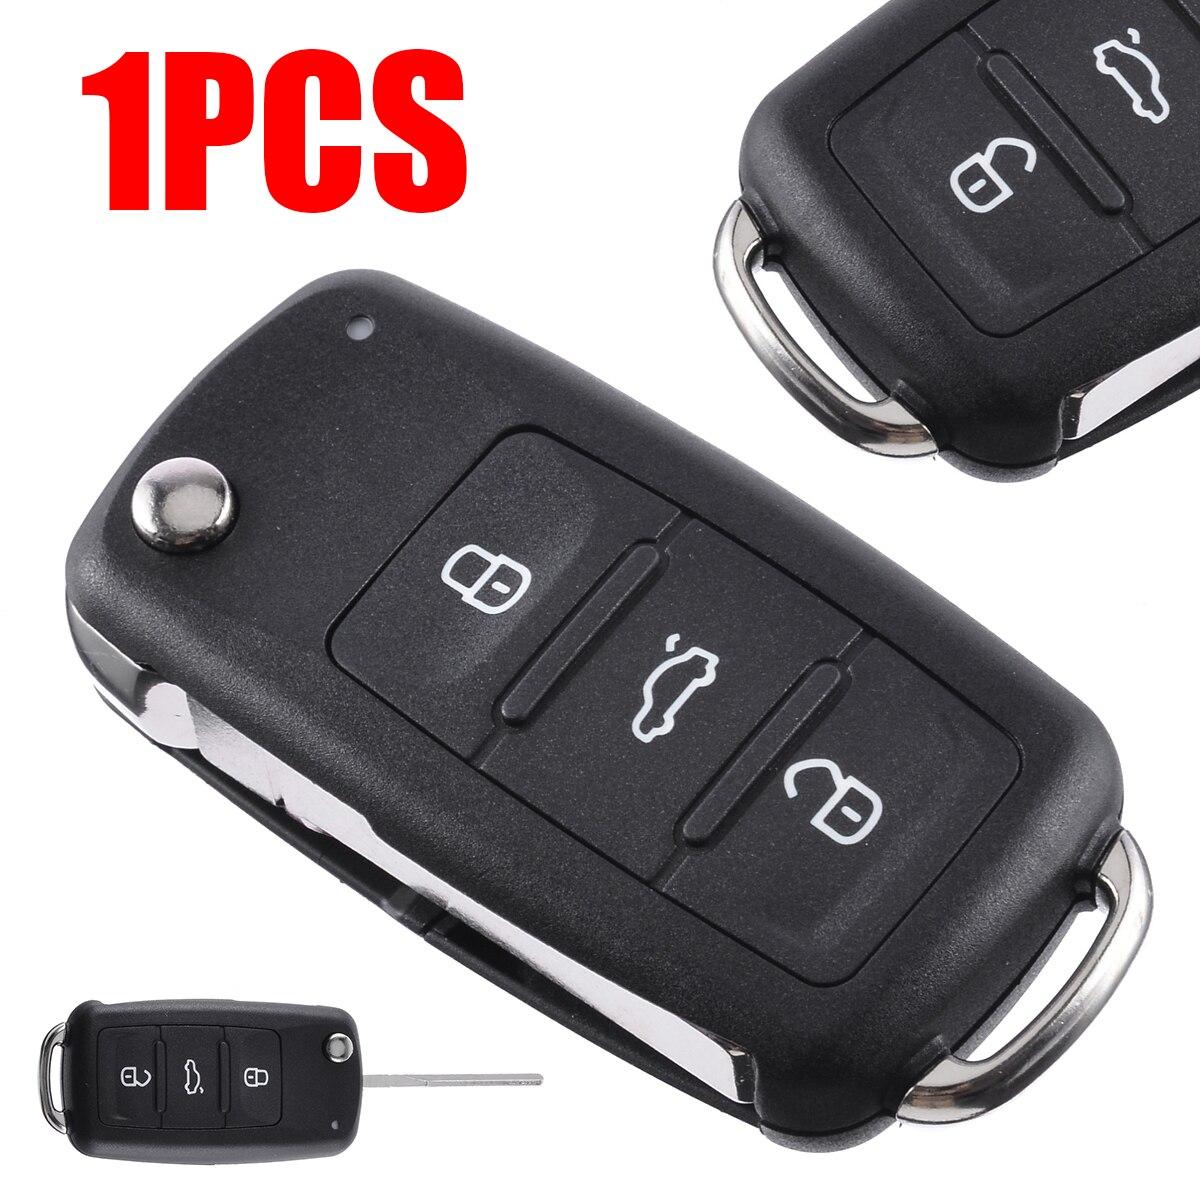 3 Button Folding Car Remote Flip Key Shell Case Fob NO LOGO for V-W Auto Ignition System With Key Blade